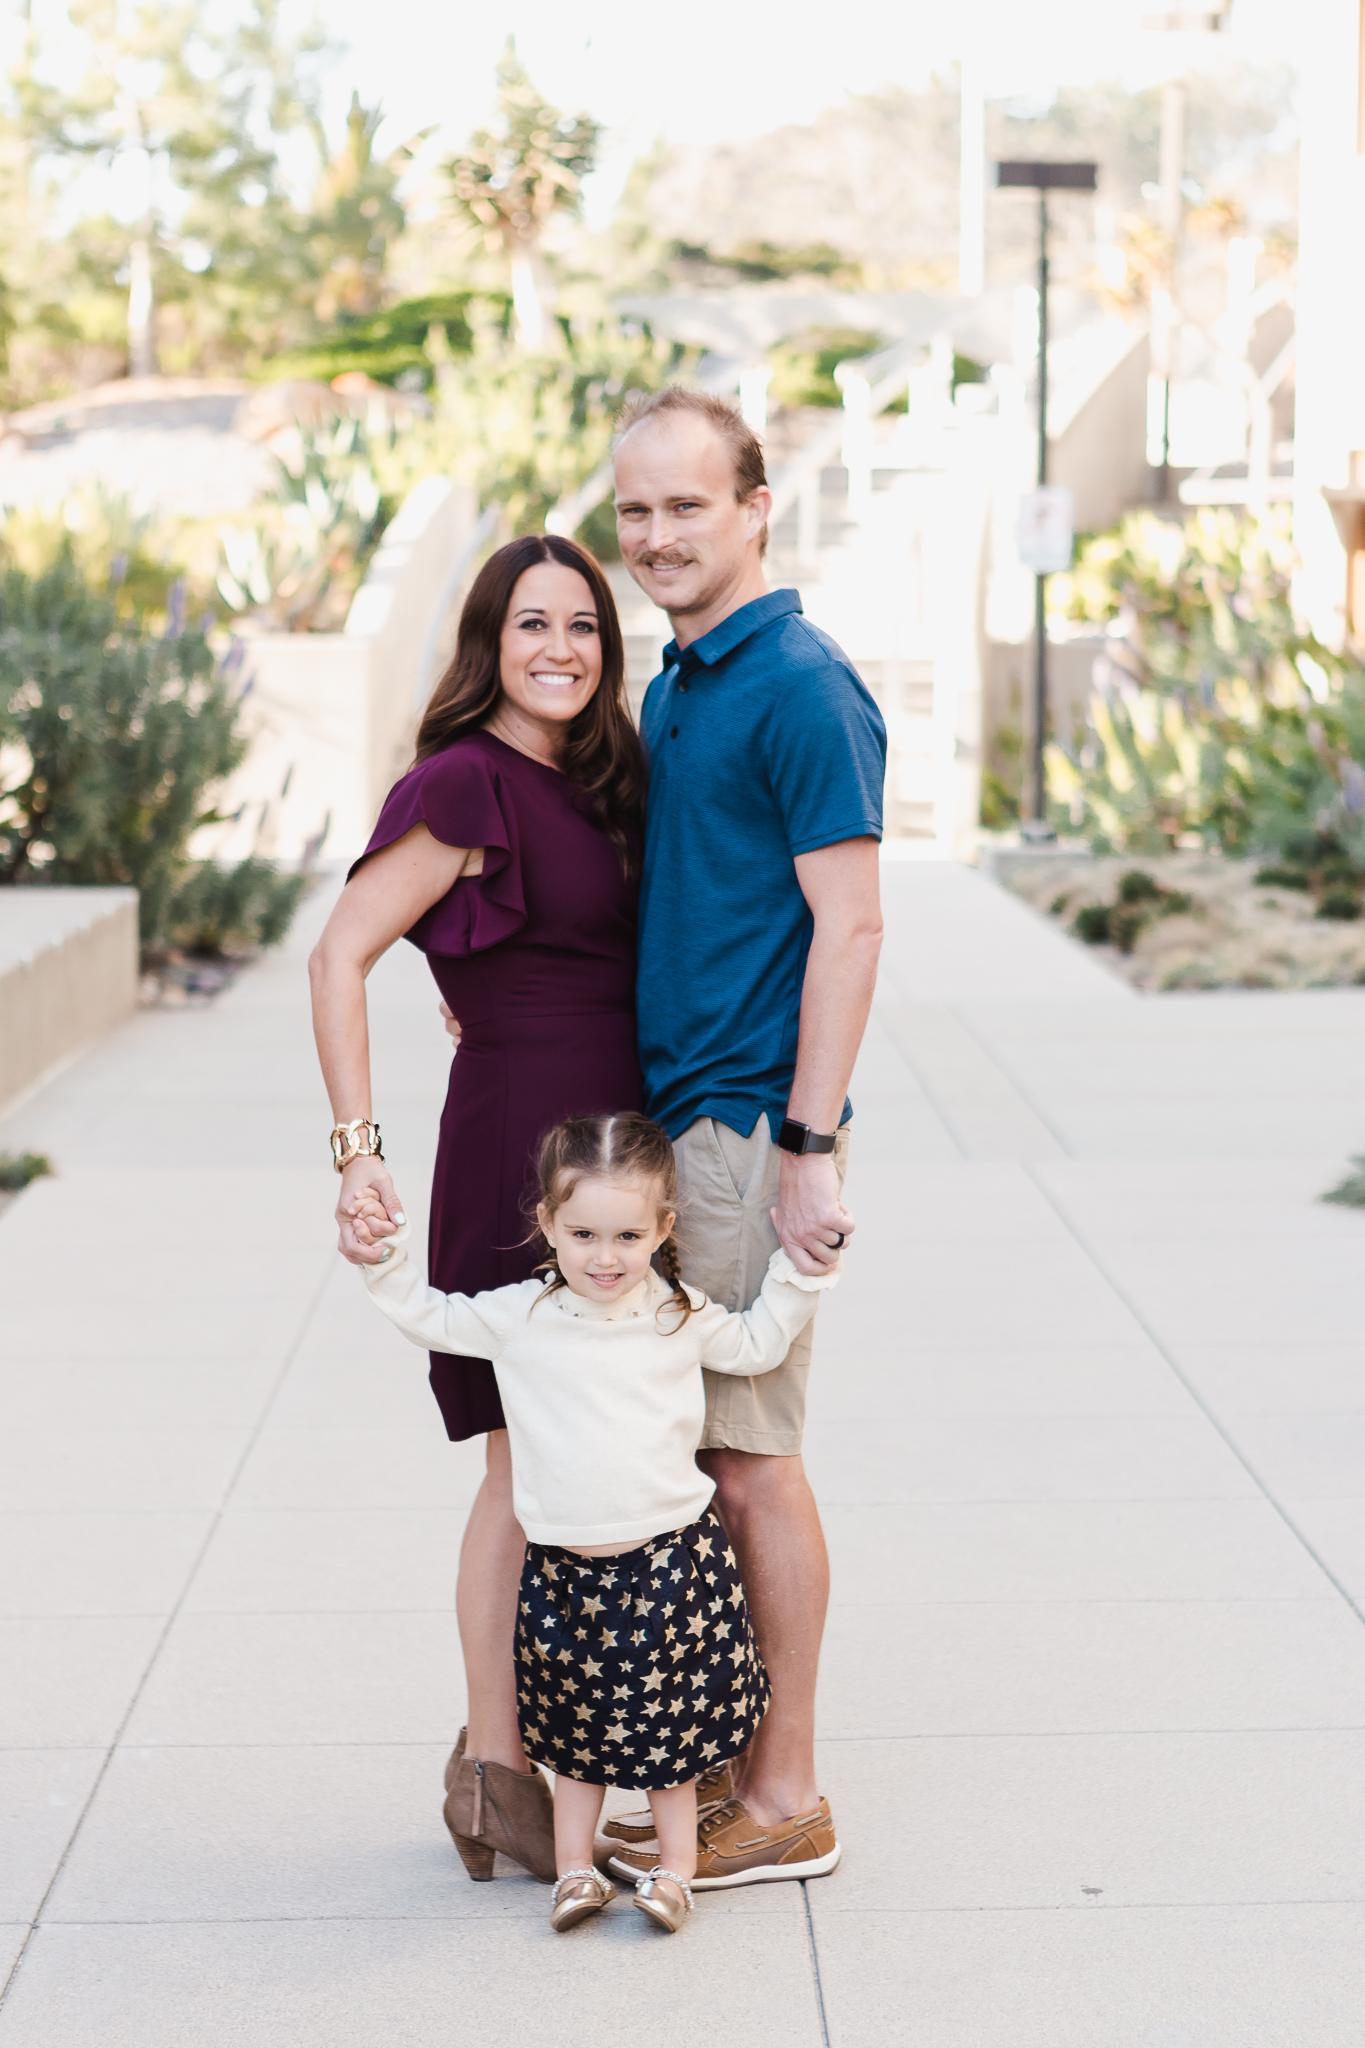 San Diego Family Photographer La Jolla Scripps Pier WS GF 2019-4.jpg